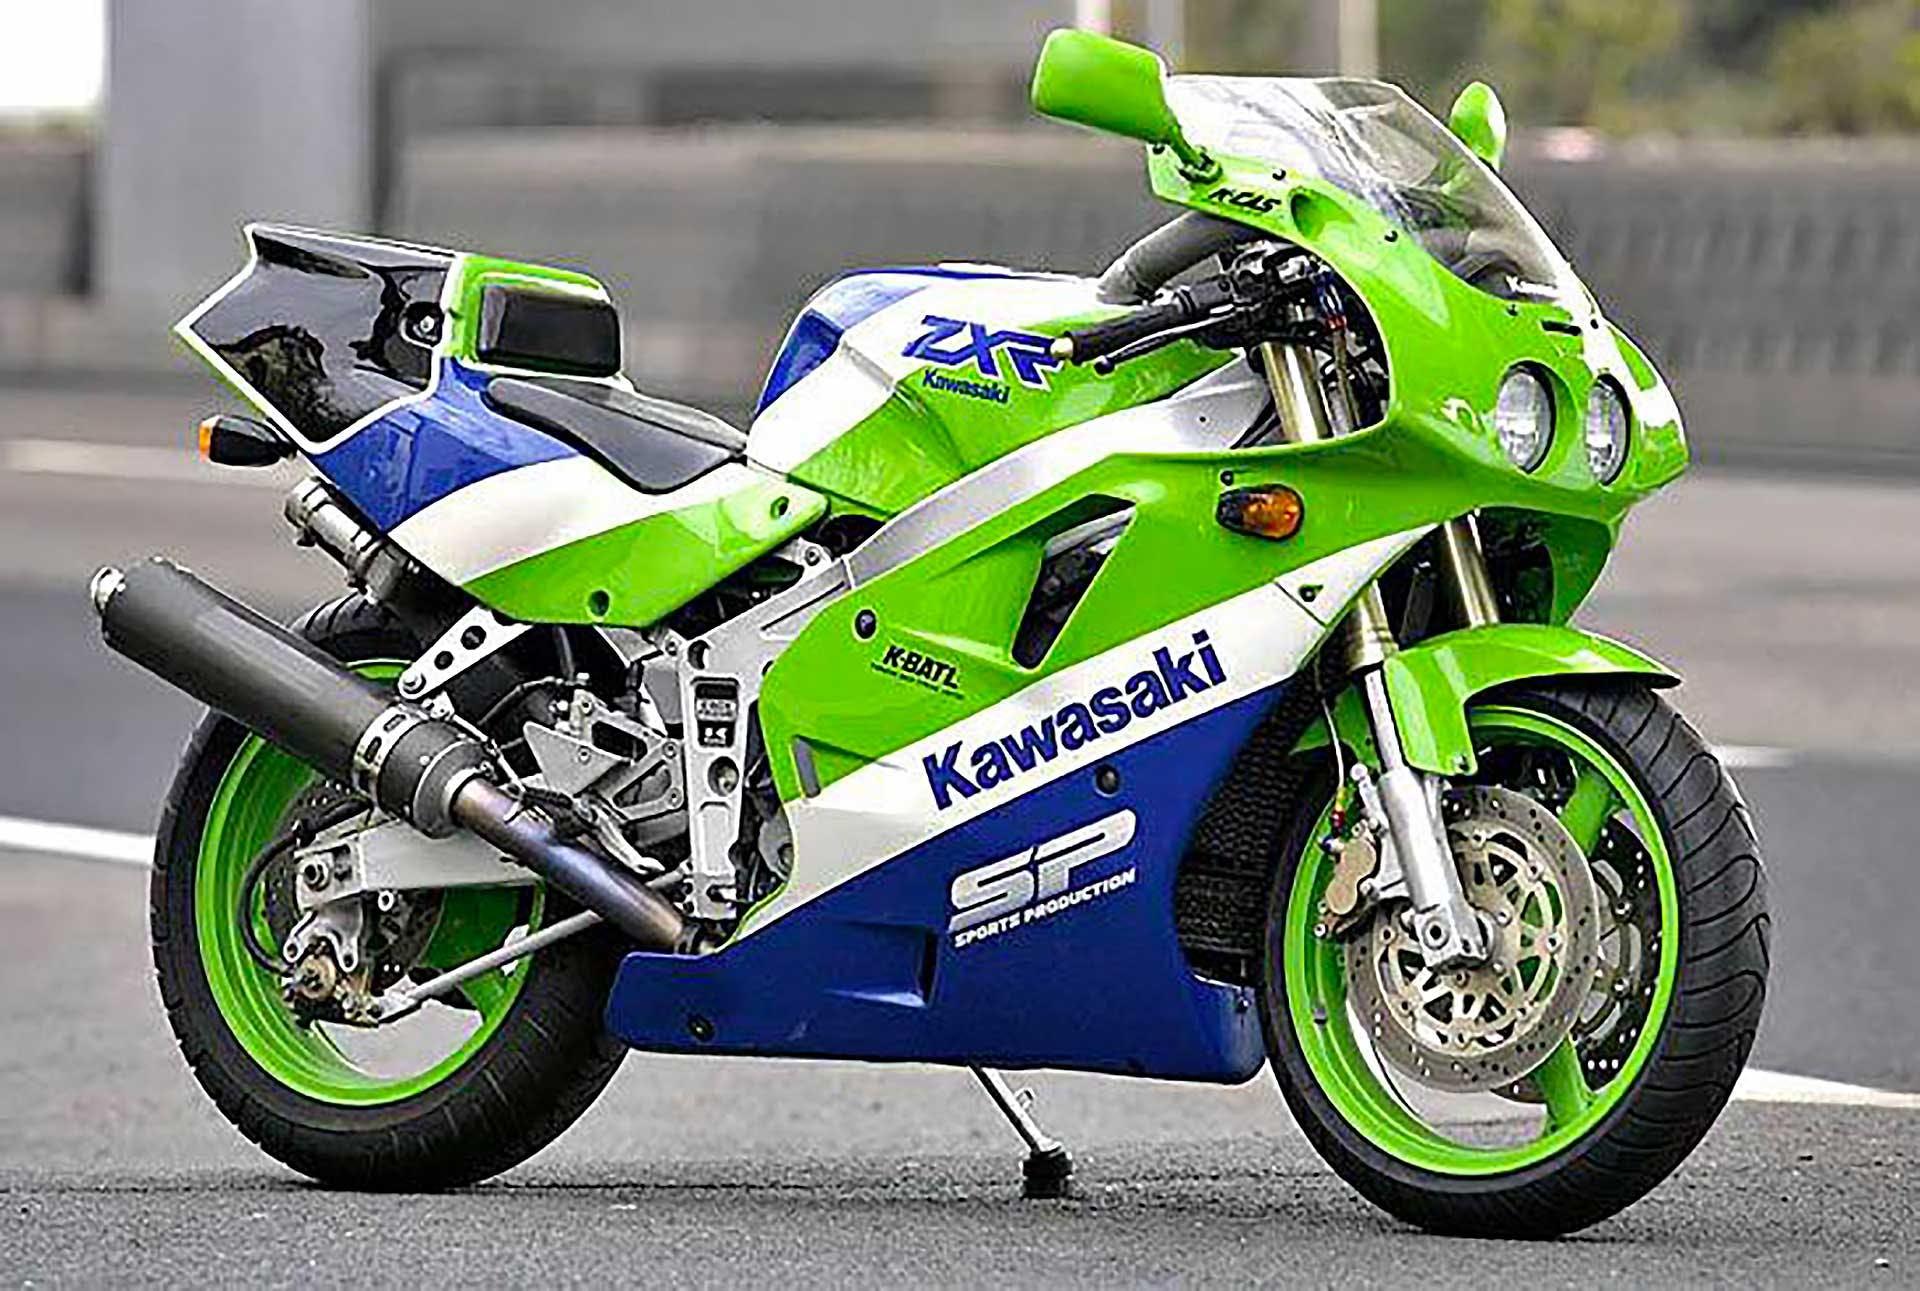 Kawasaki-ZXR400.jpg?auto=format%2Ccompre